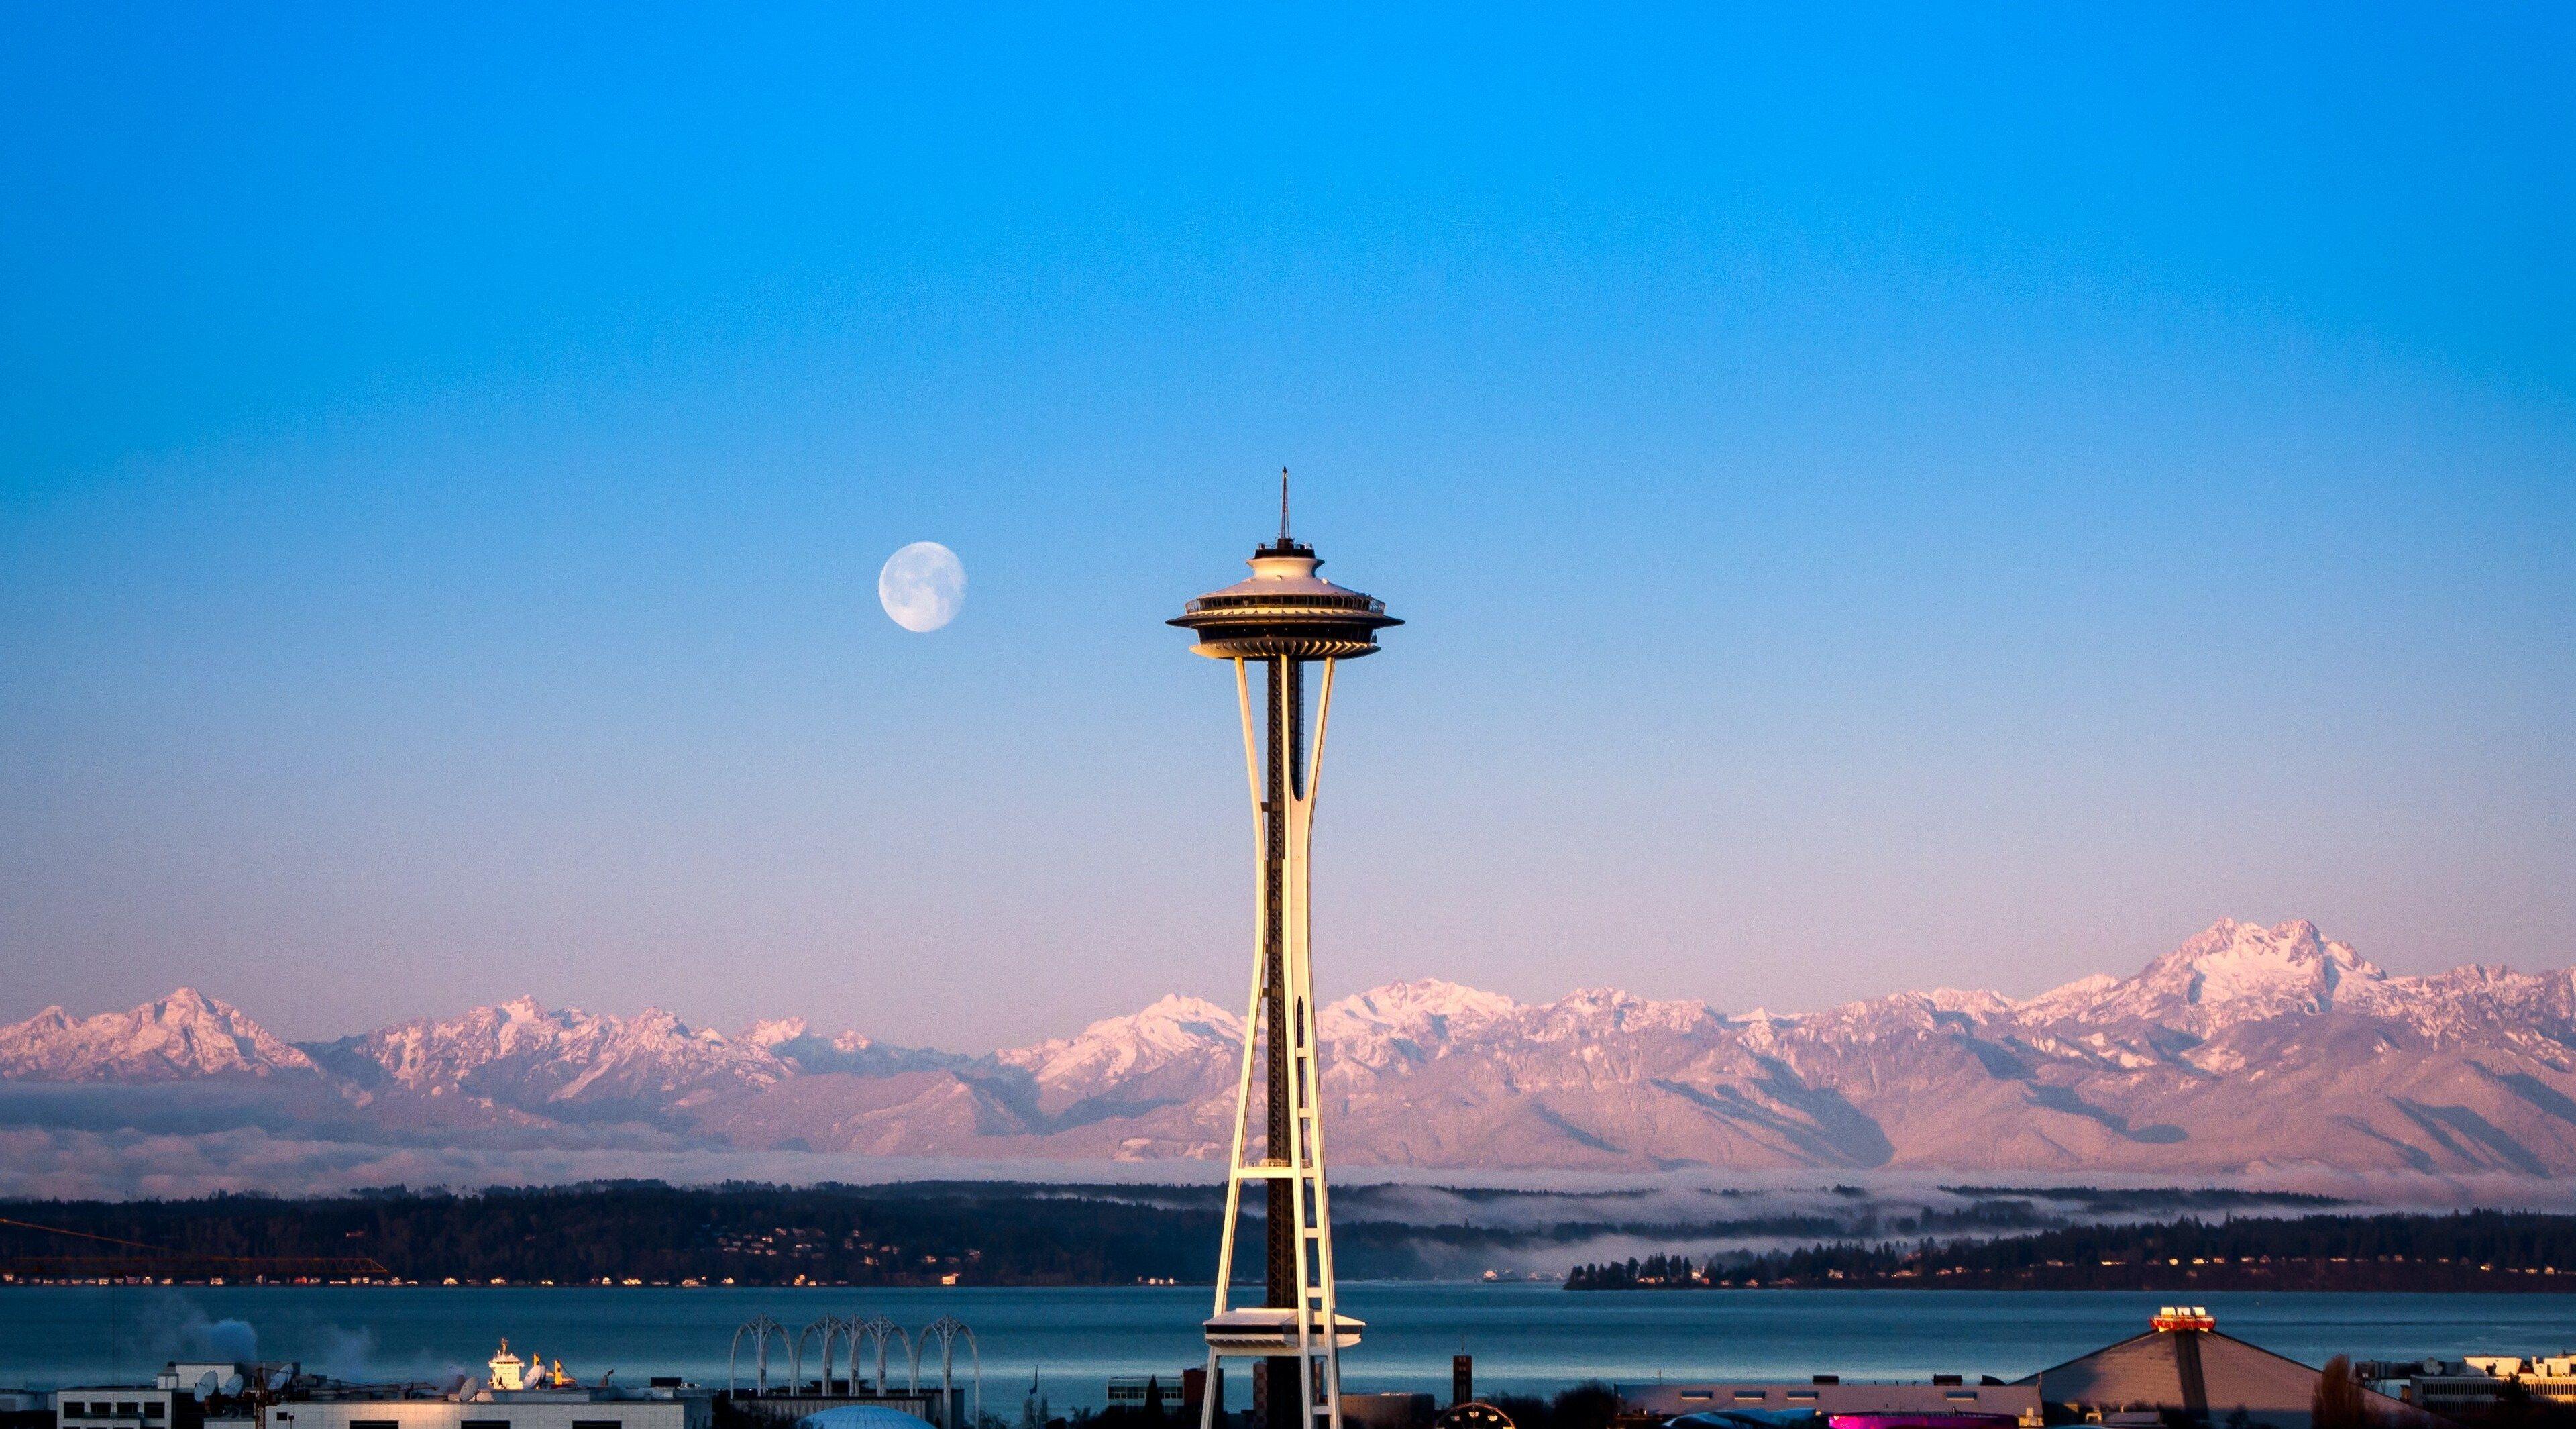 3840x2130 Seattle 4k Background Image Fondos De Pantalla Wallpaper Para Pc Imagenes En Hd